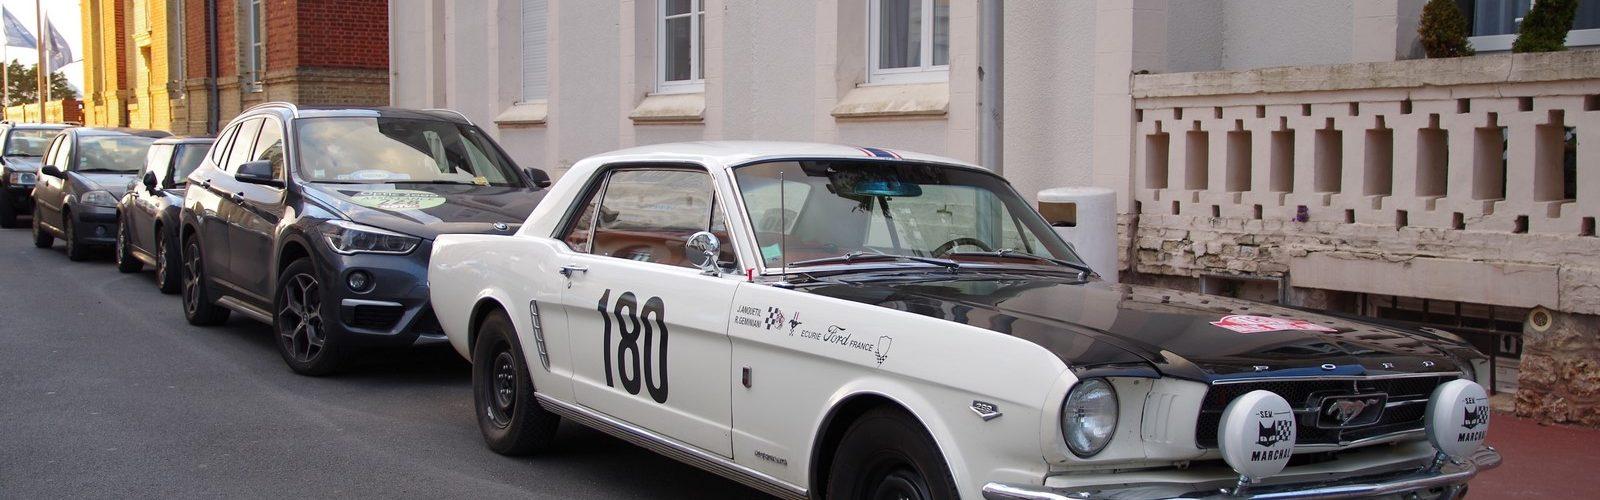 Tour Auto 2019 LNA F.Mortier Deauville 471